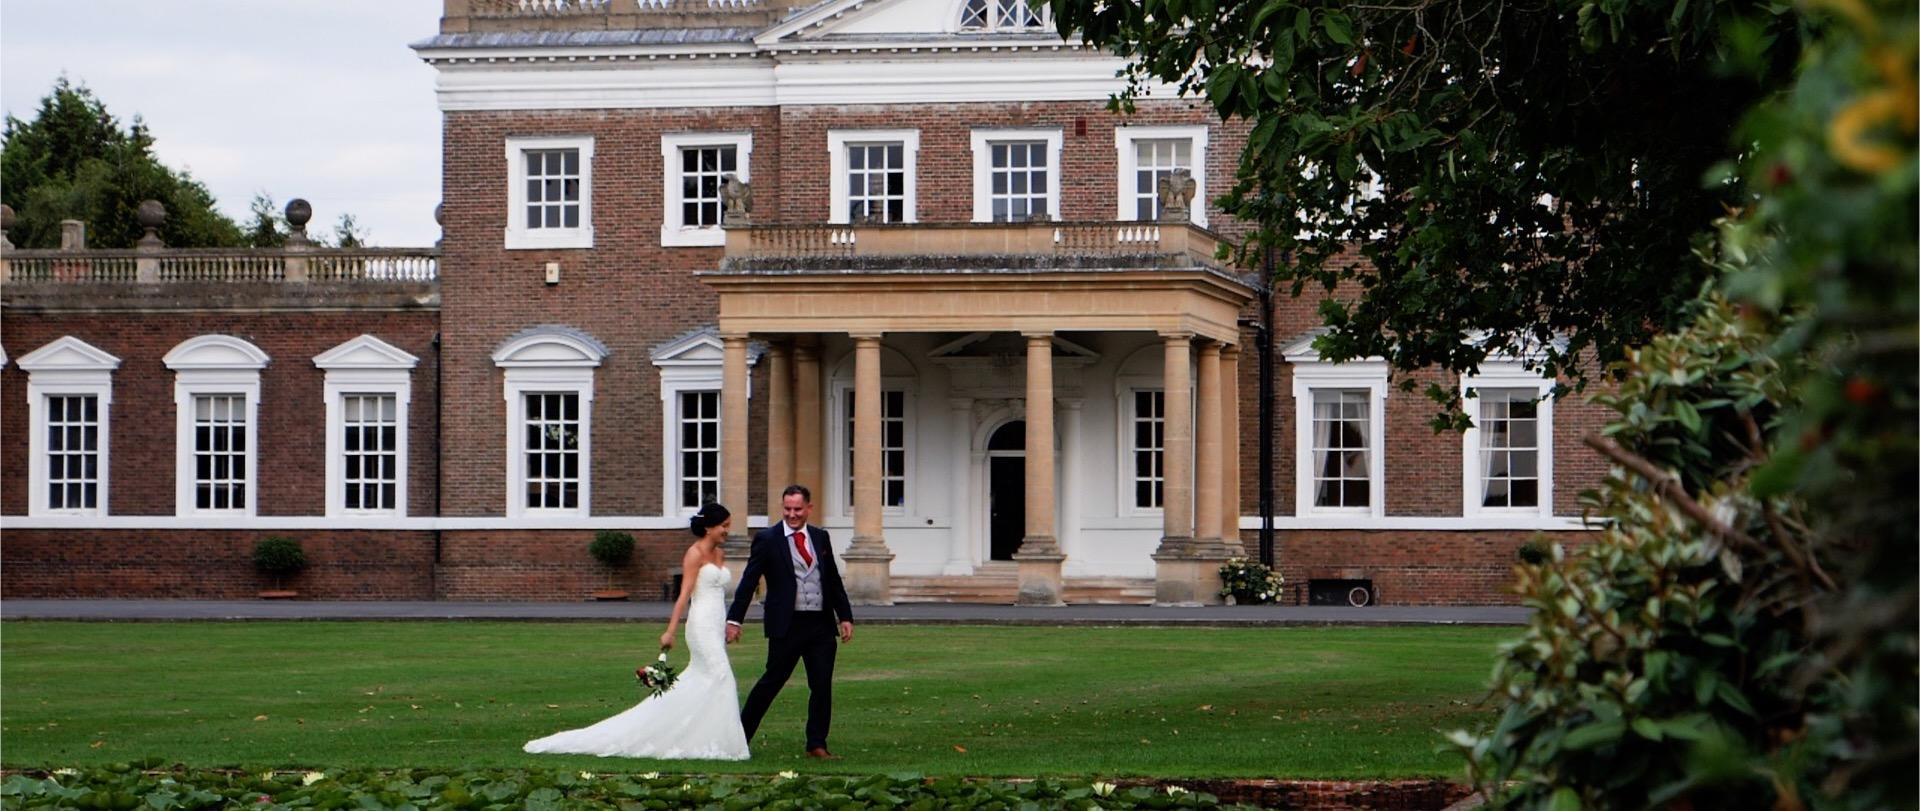 Boreham House Wedding Videography